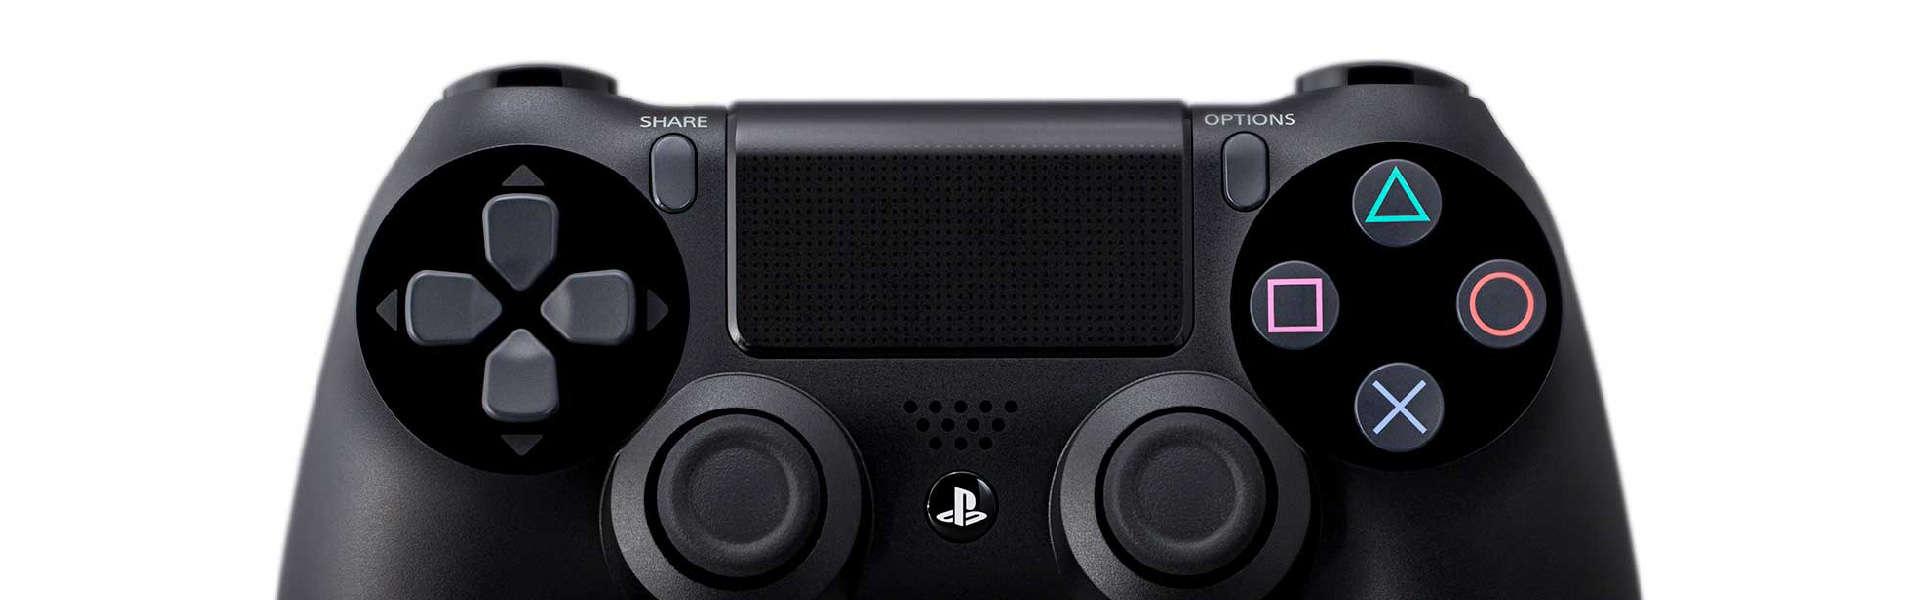 DualShock 4 Review